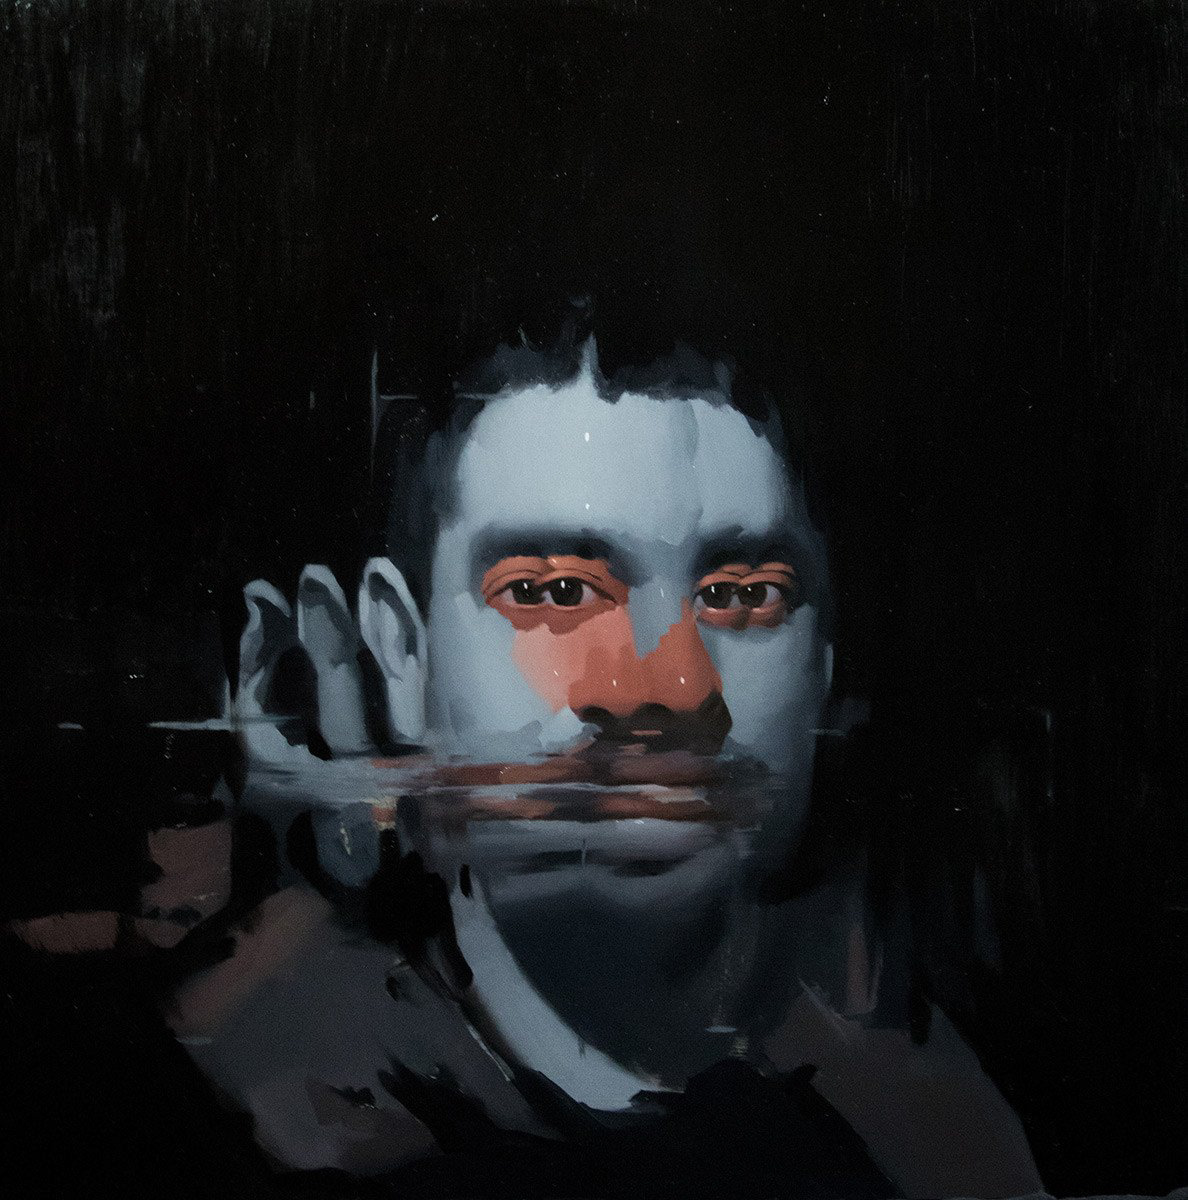 human-faces-emilio-villalba-everythingwithatwist-06